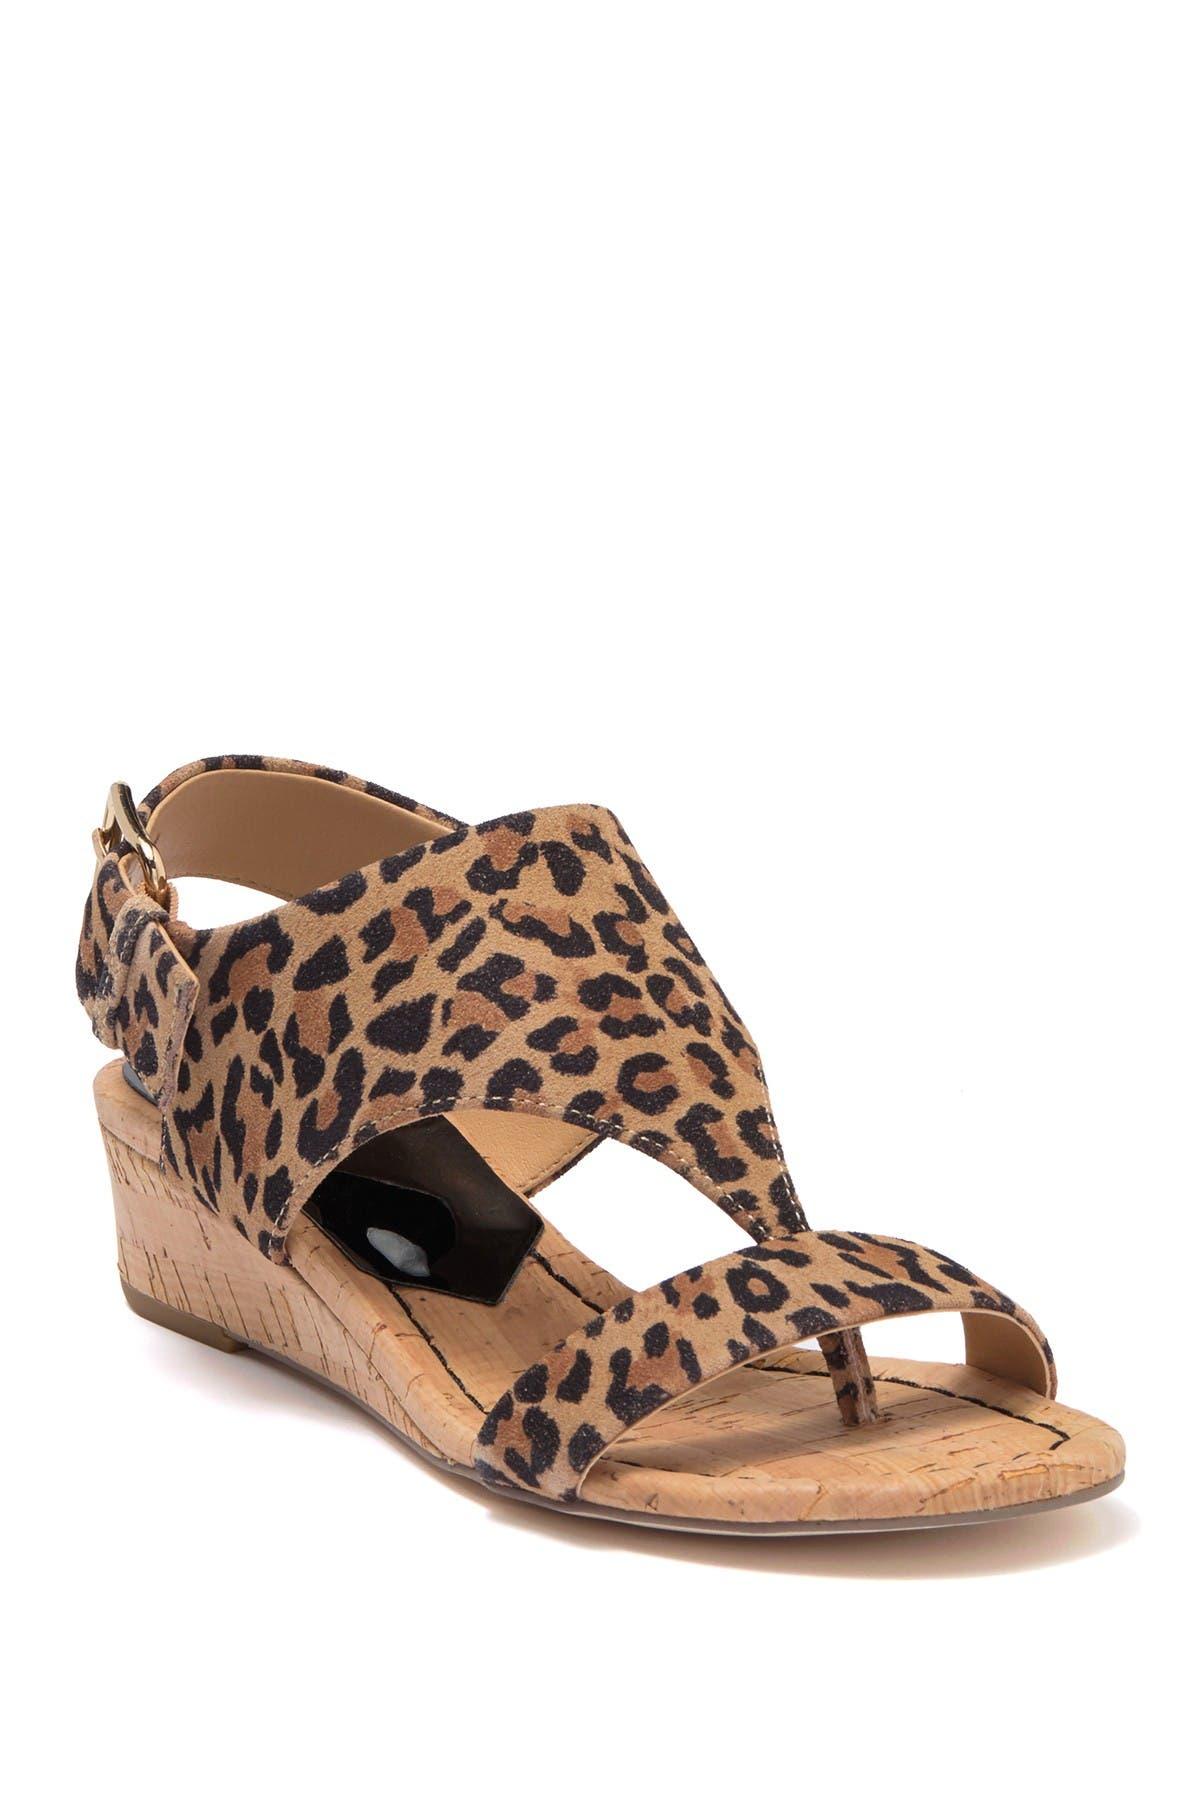 Image of Donald Pliner Dalton Leopard Print Wedge Thong Sandal